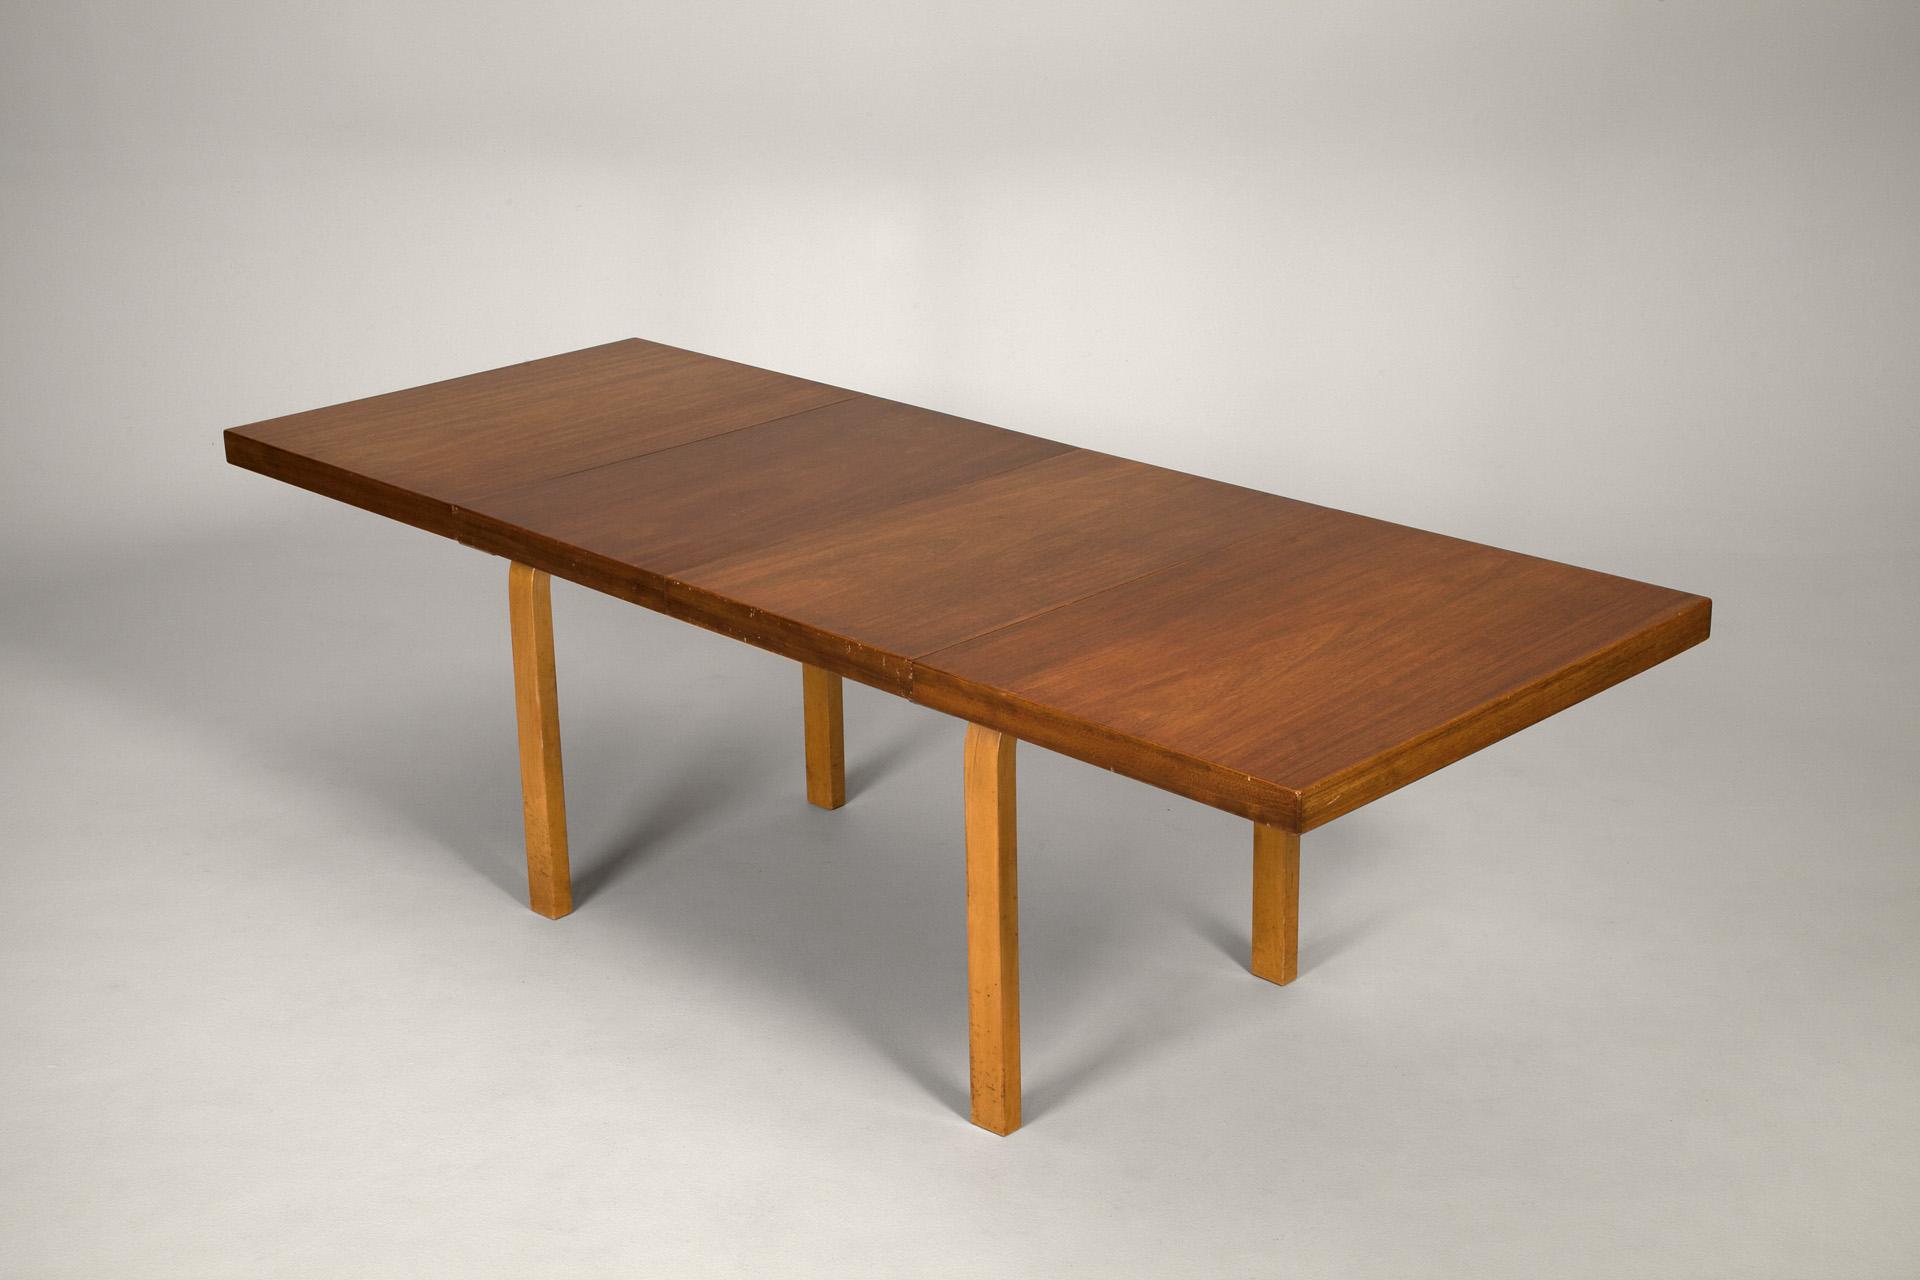 jacksons dining table alvar aalto. Black Bedroom Furniture Sets. Home Design Ideas